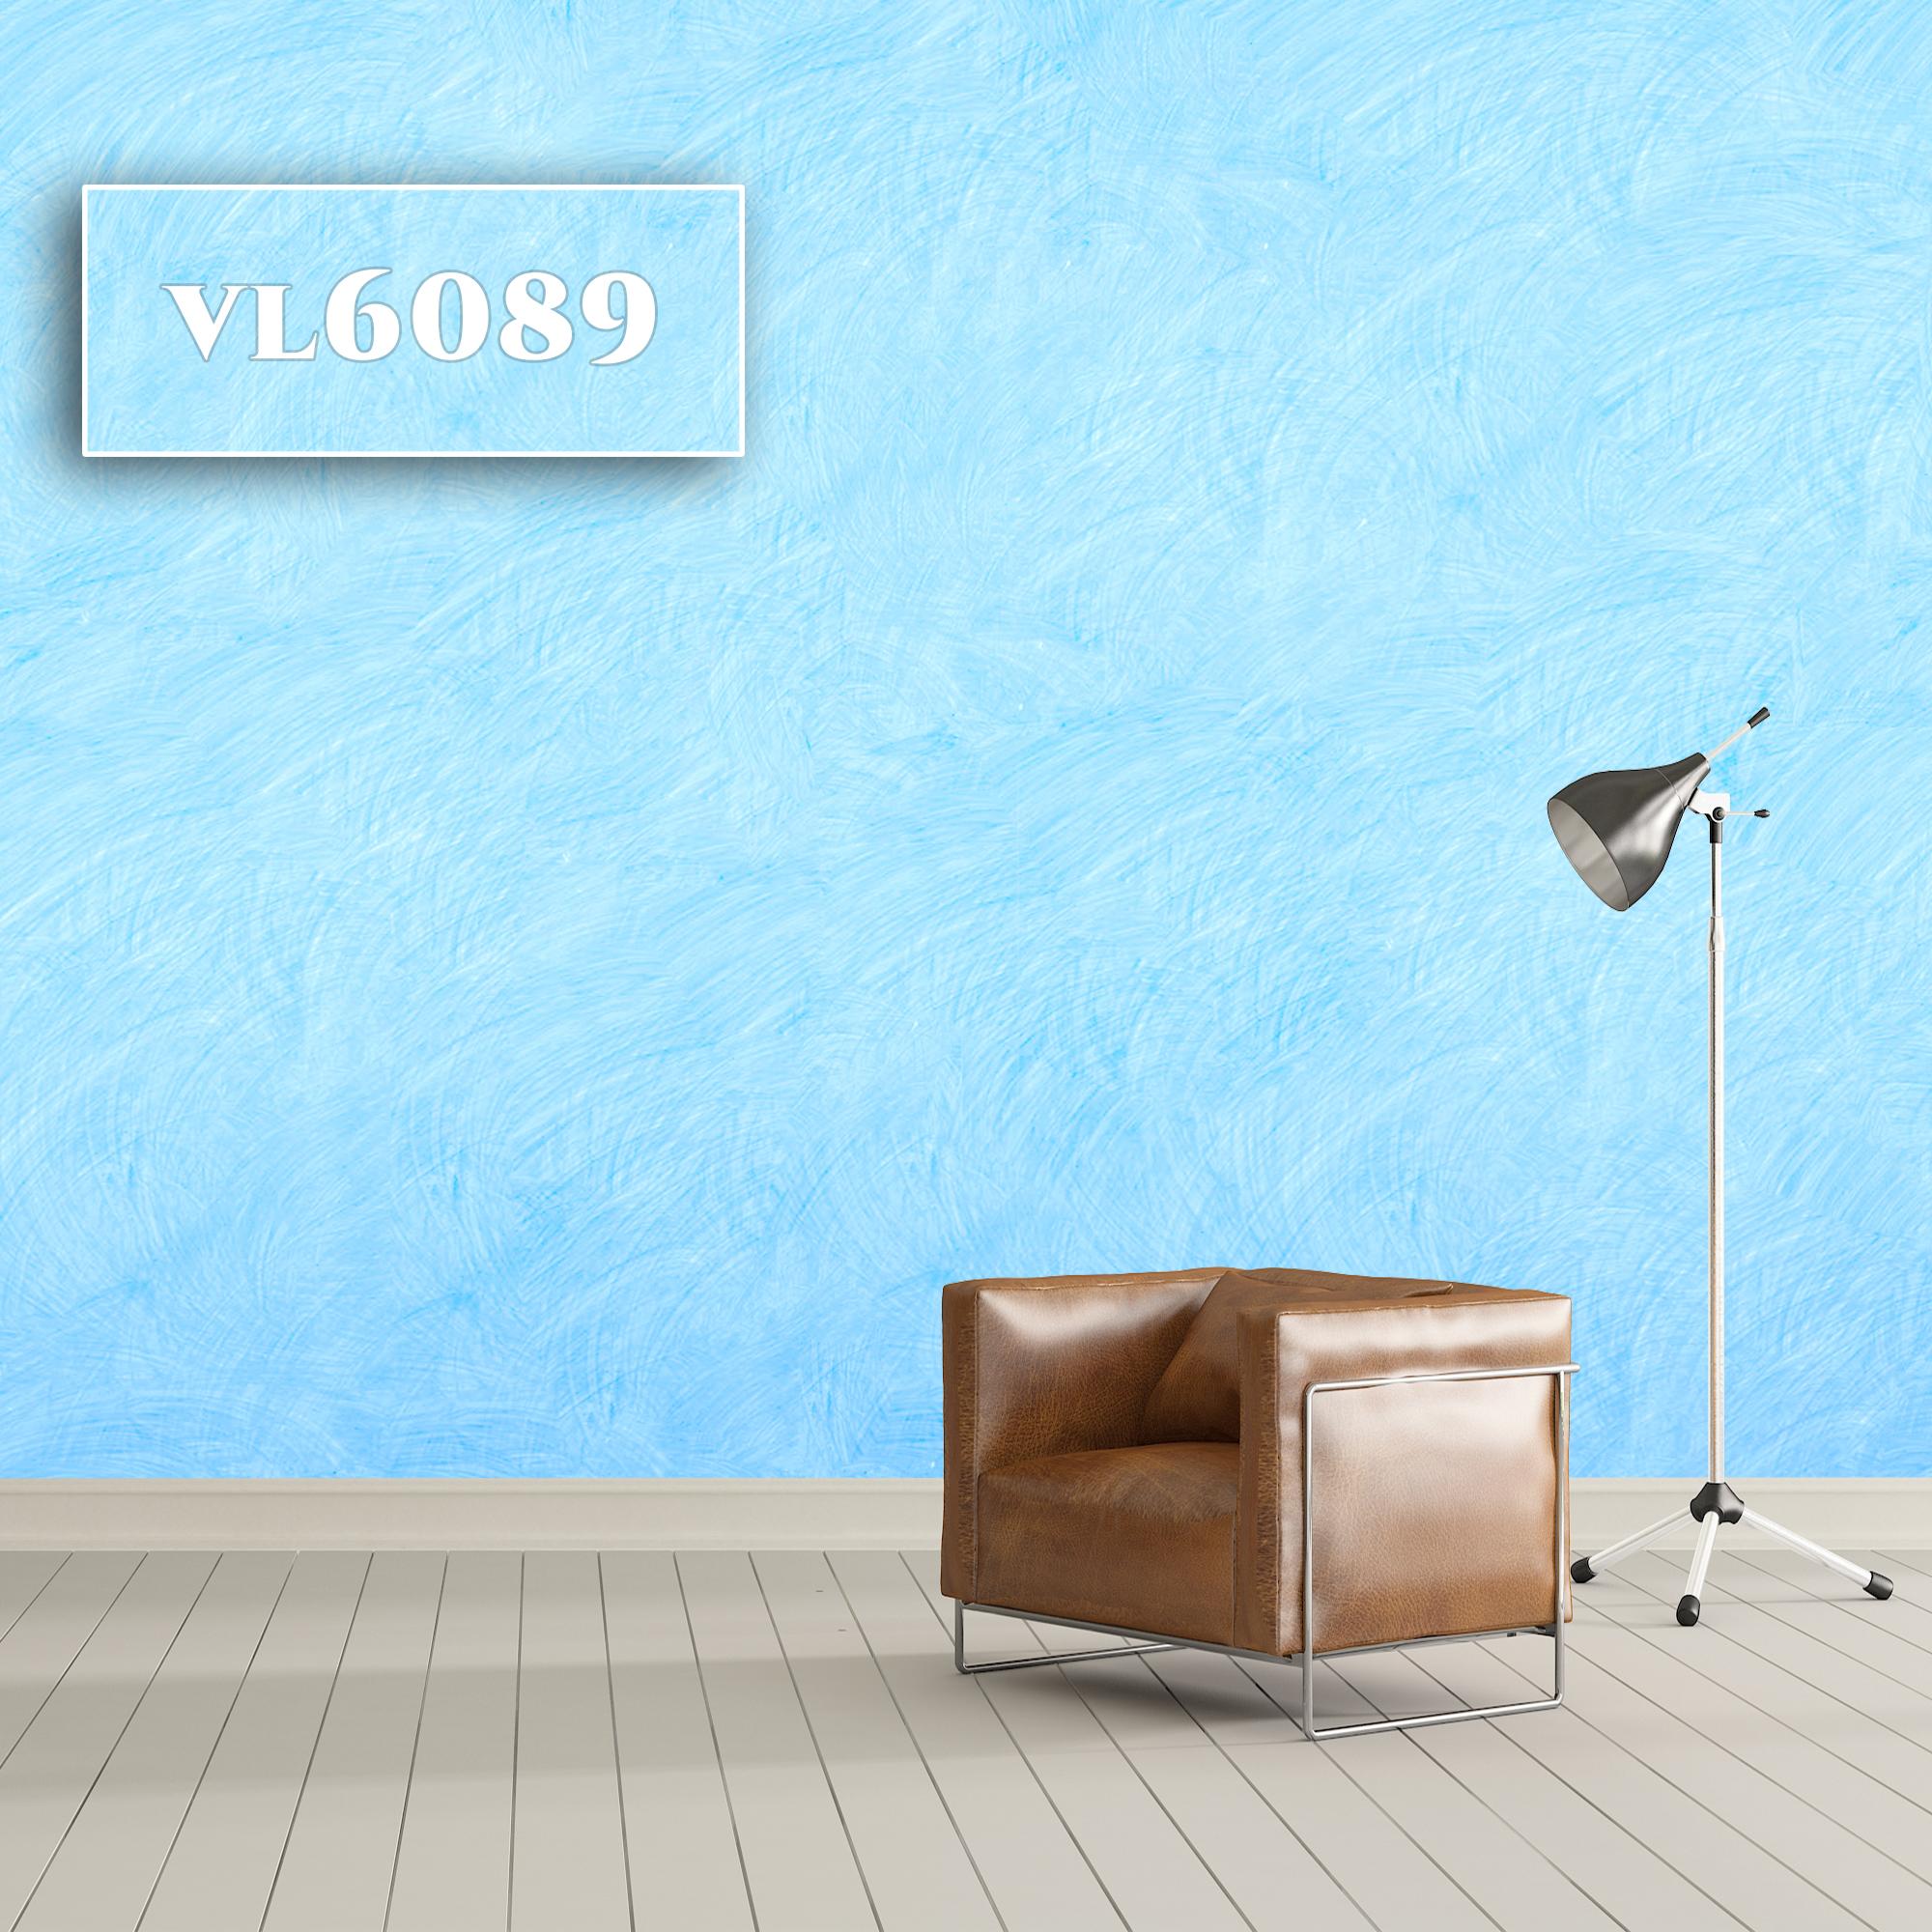 VL6089